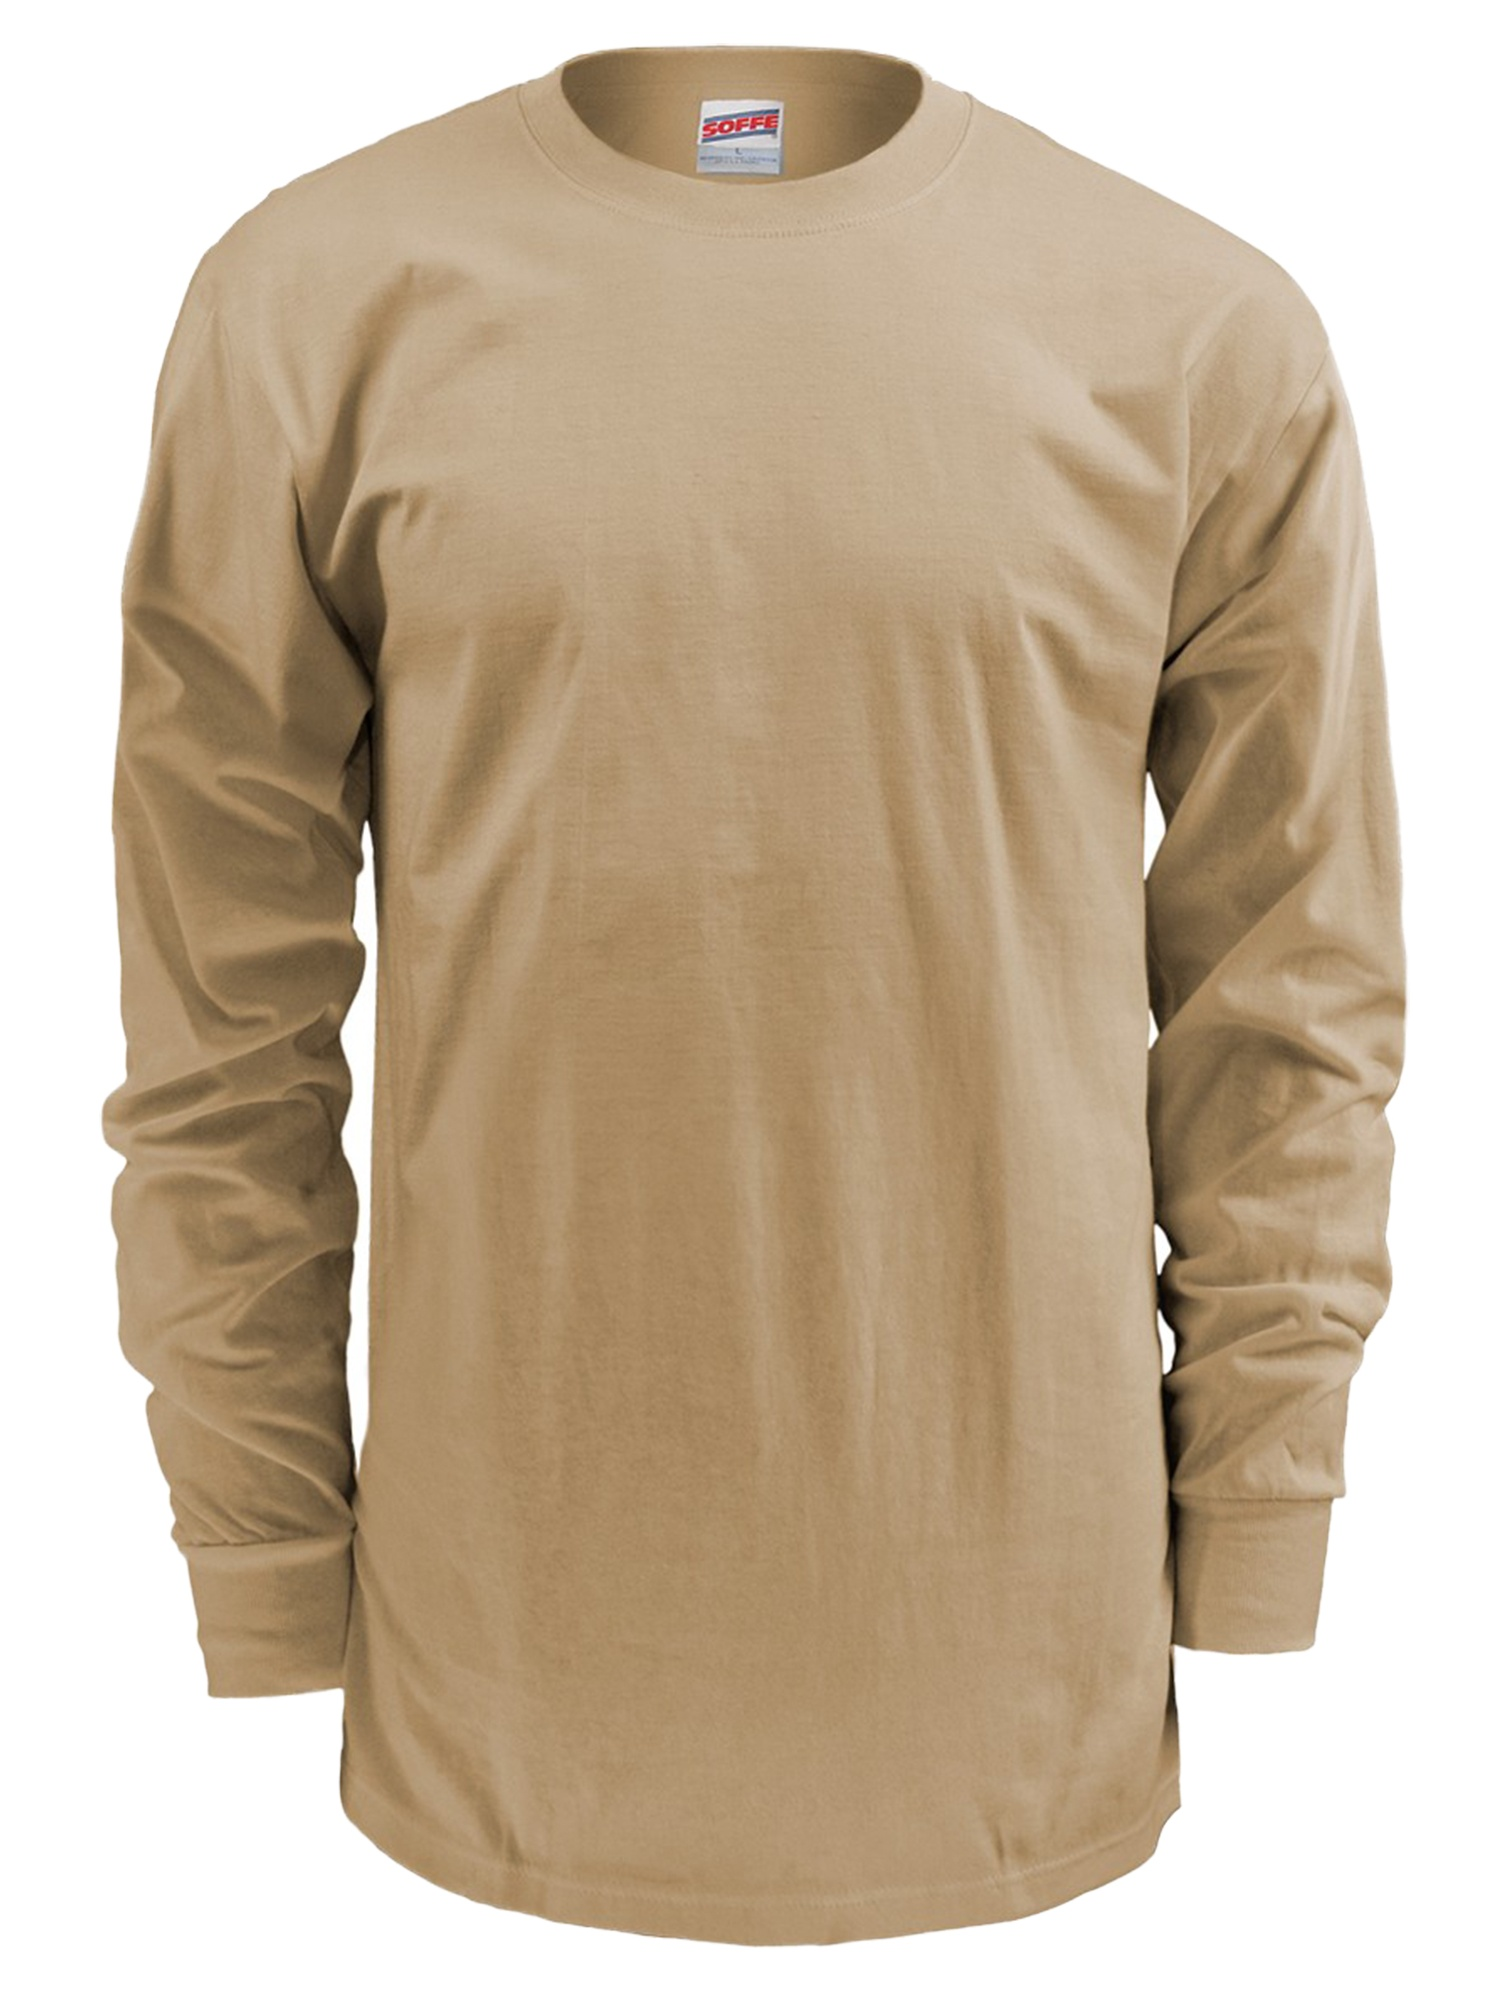 Soffe Mens Long-Sleeve Cotton T-Shirt